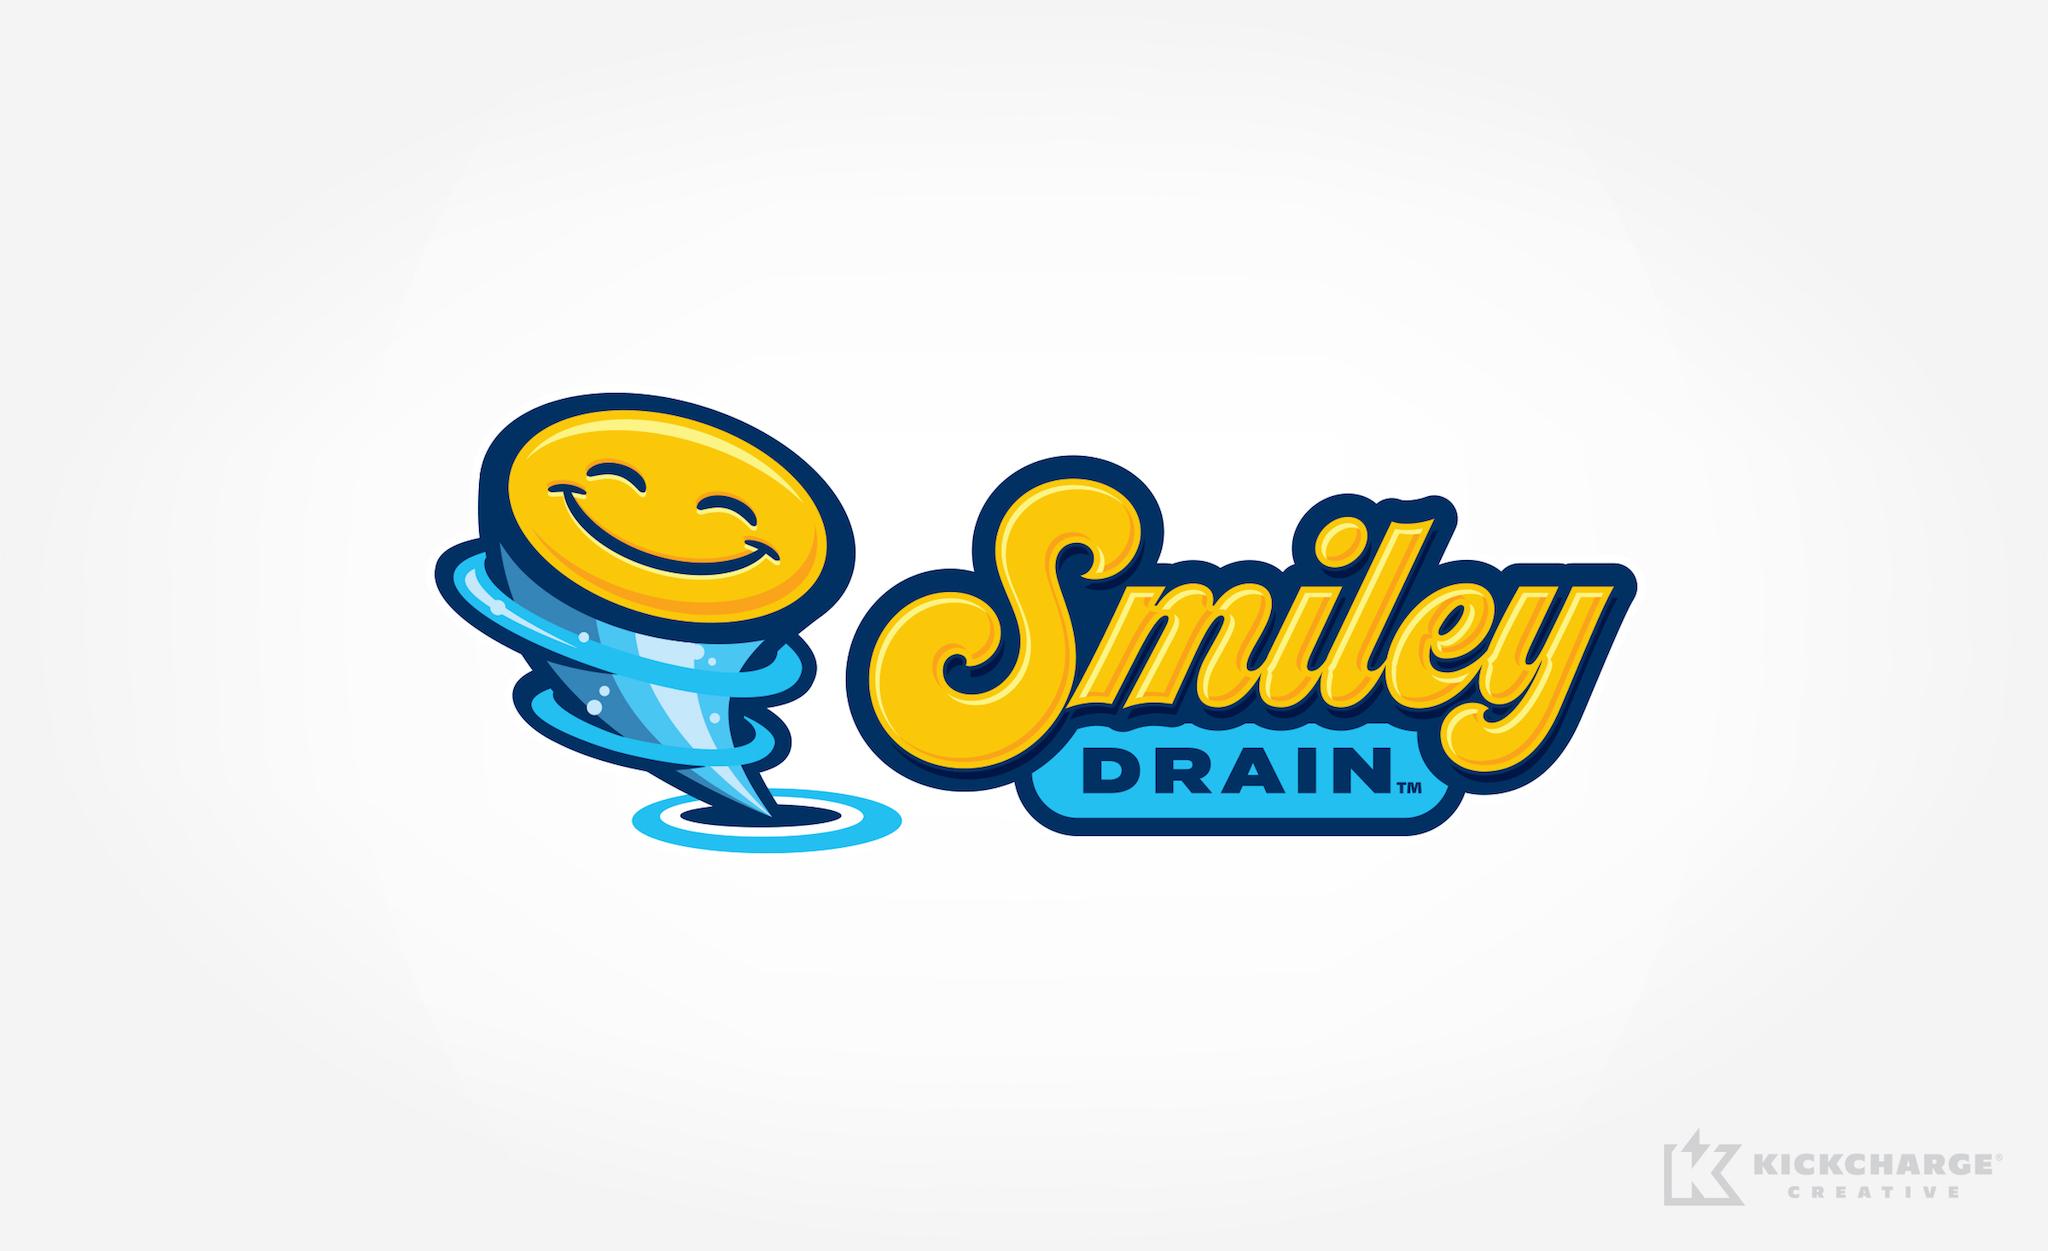 plumbing logo for Smiley Drain